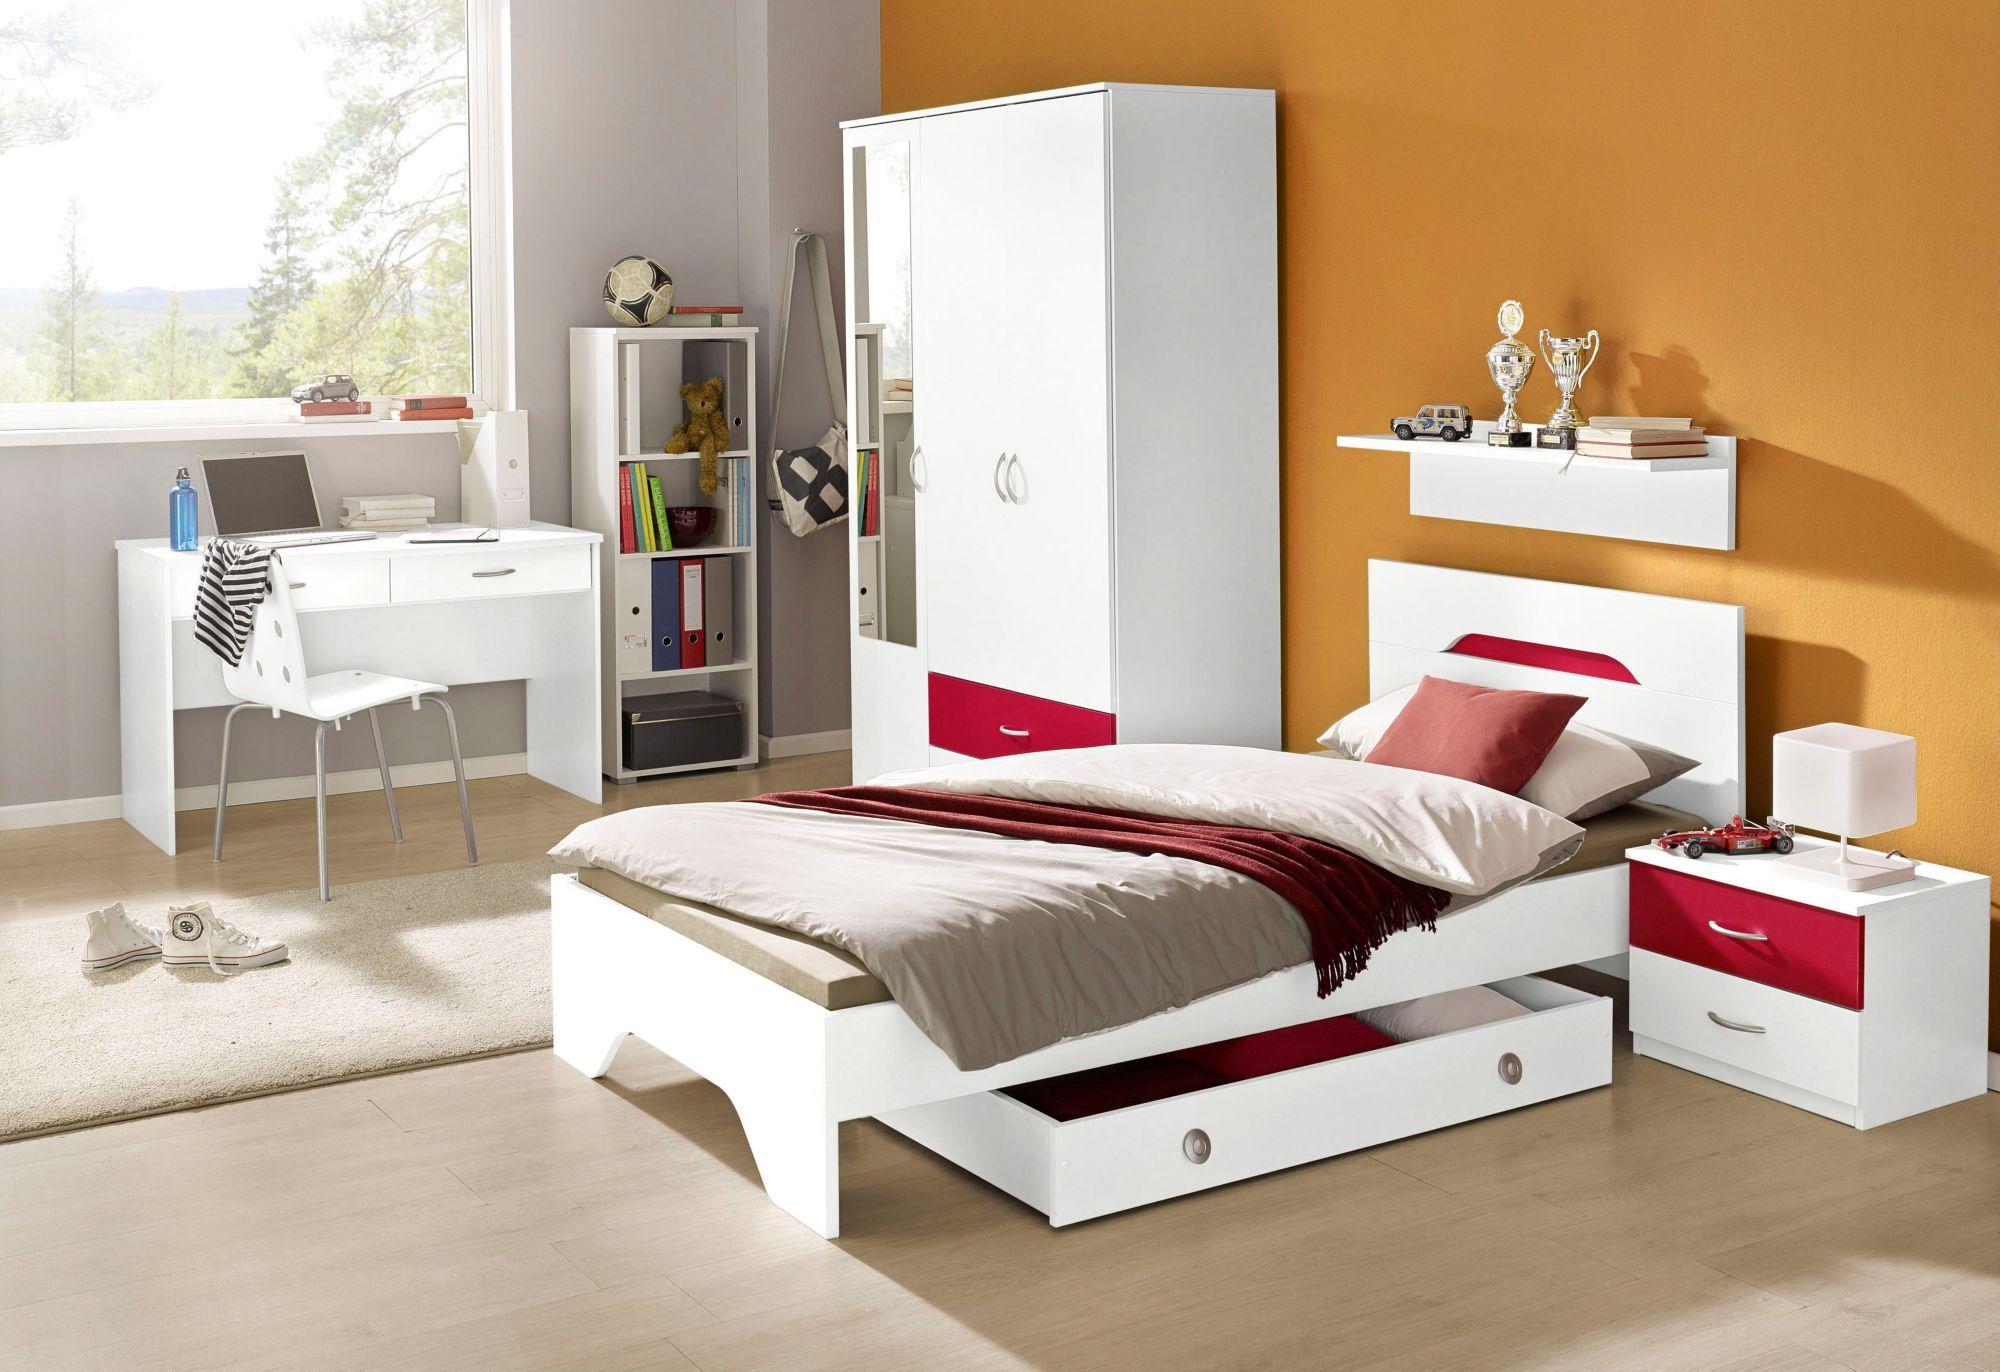 futonbetten im schwab online shop m bel betten. Black Bedroom Furniture Sets. Home Design Ideas